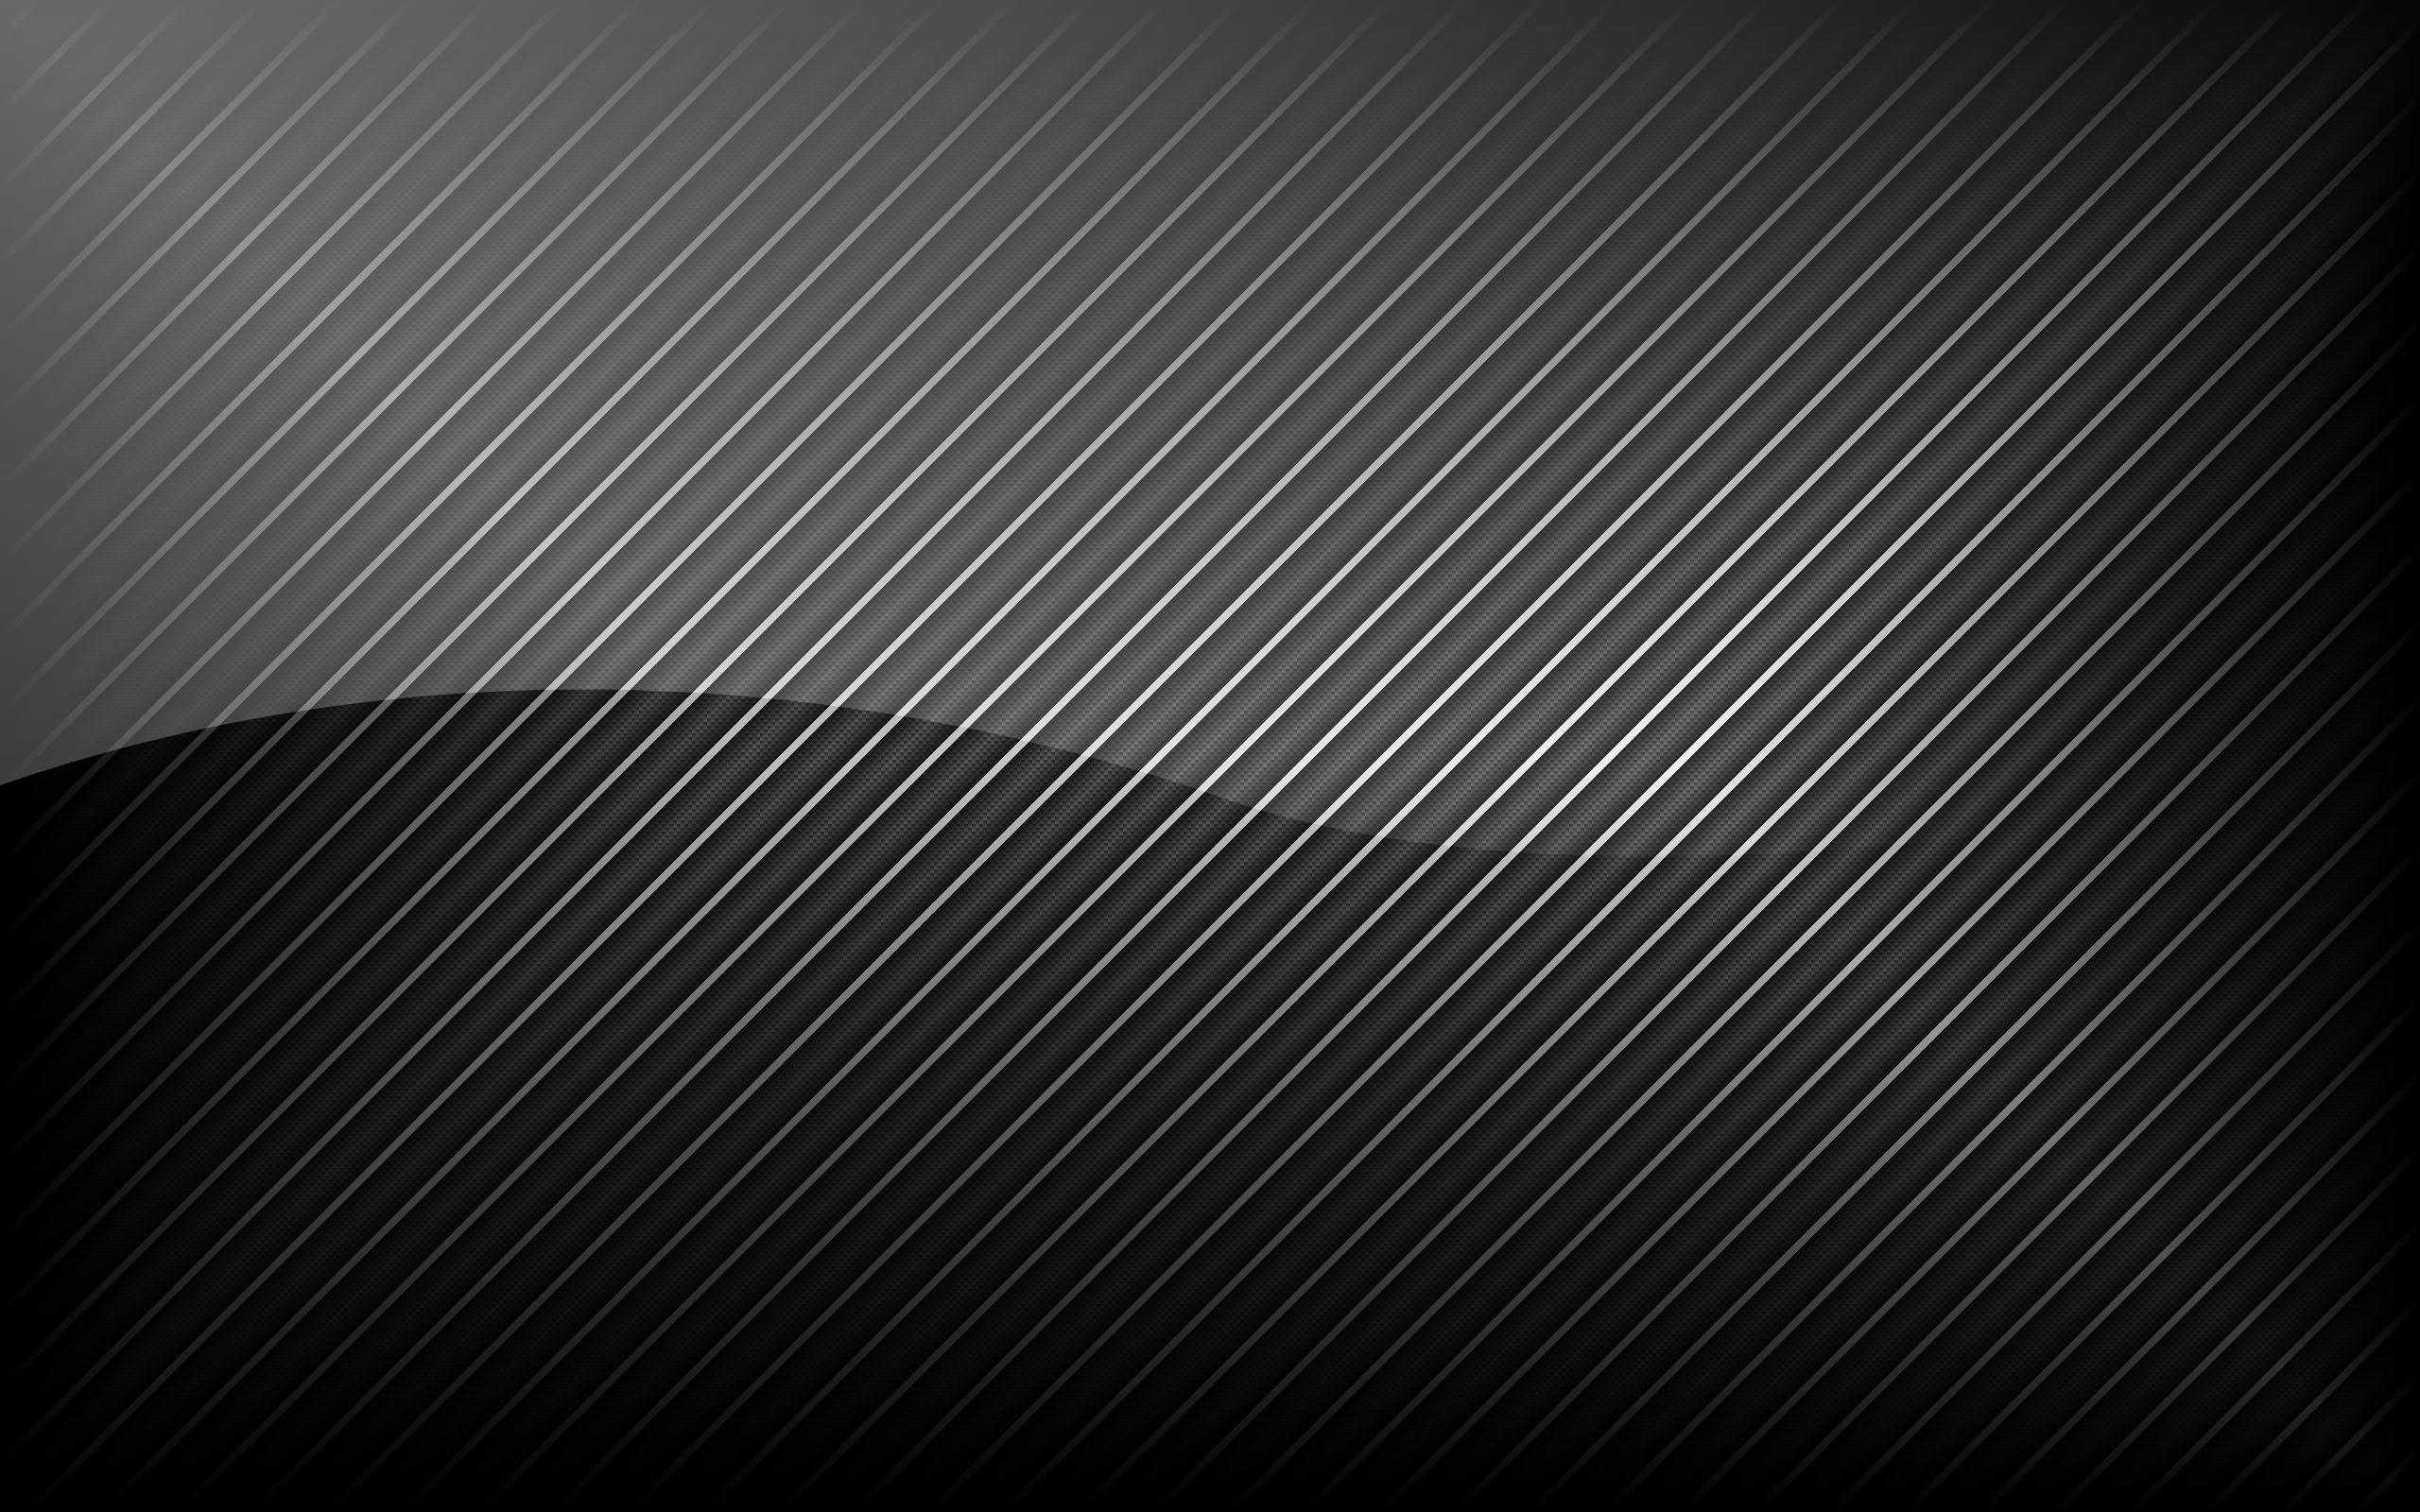 carbon fiber wallpaper full hd images for laptop | wallvie